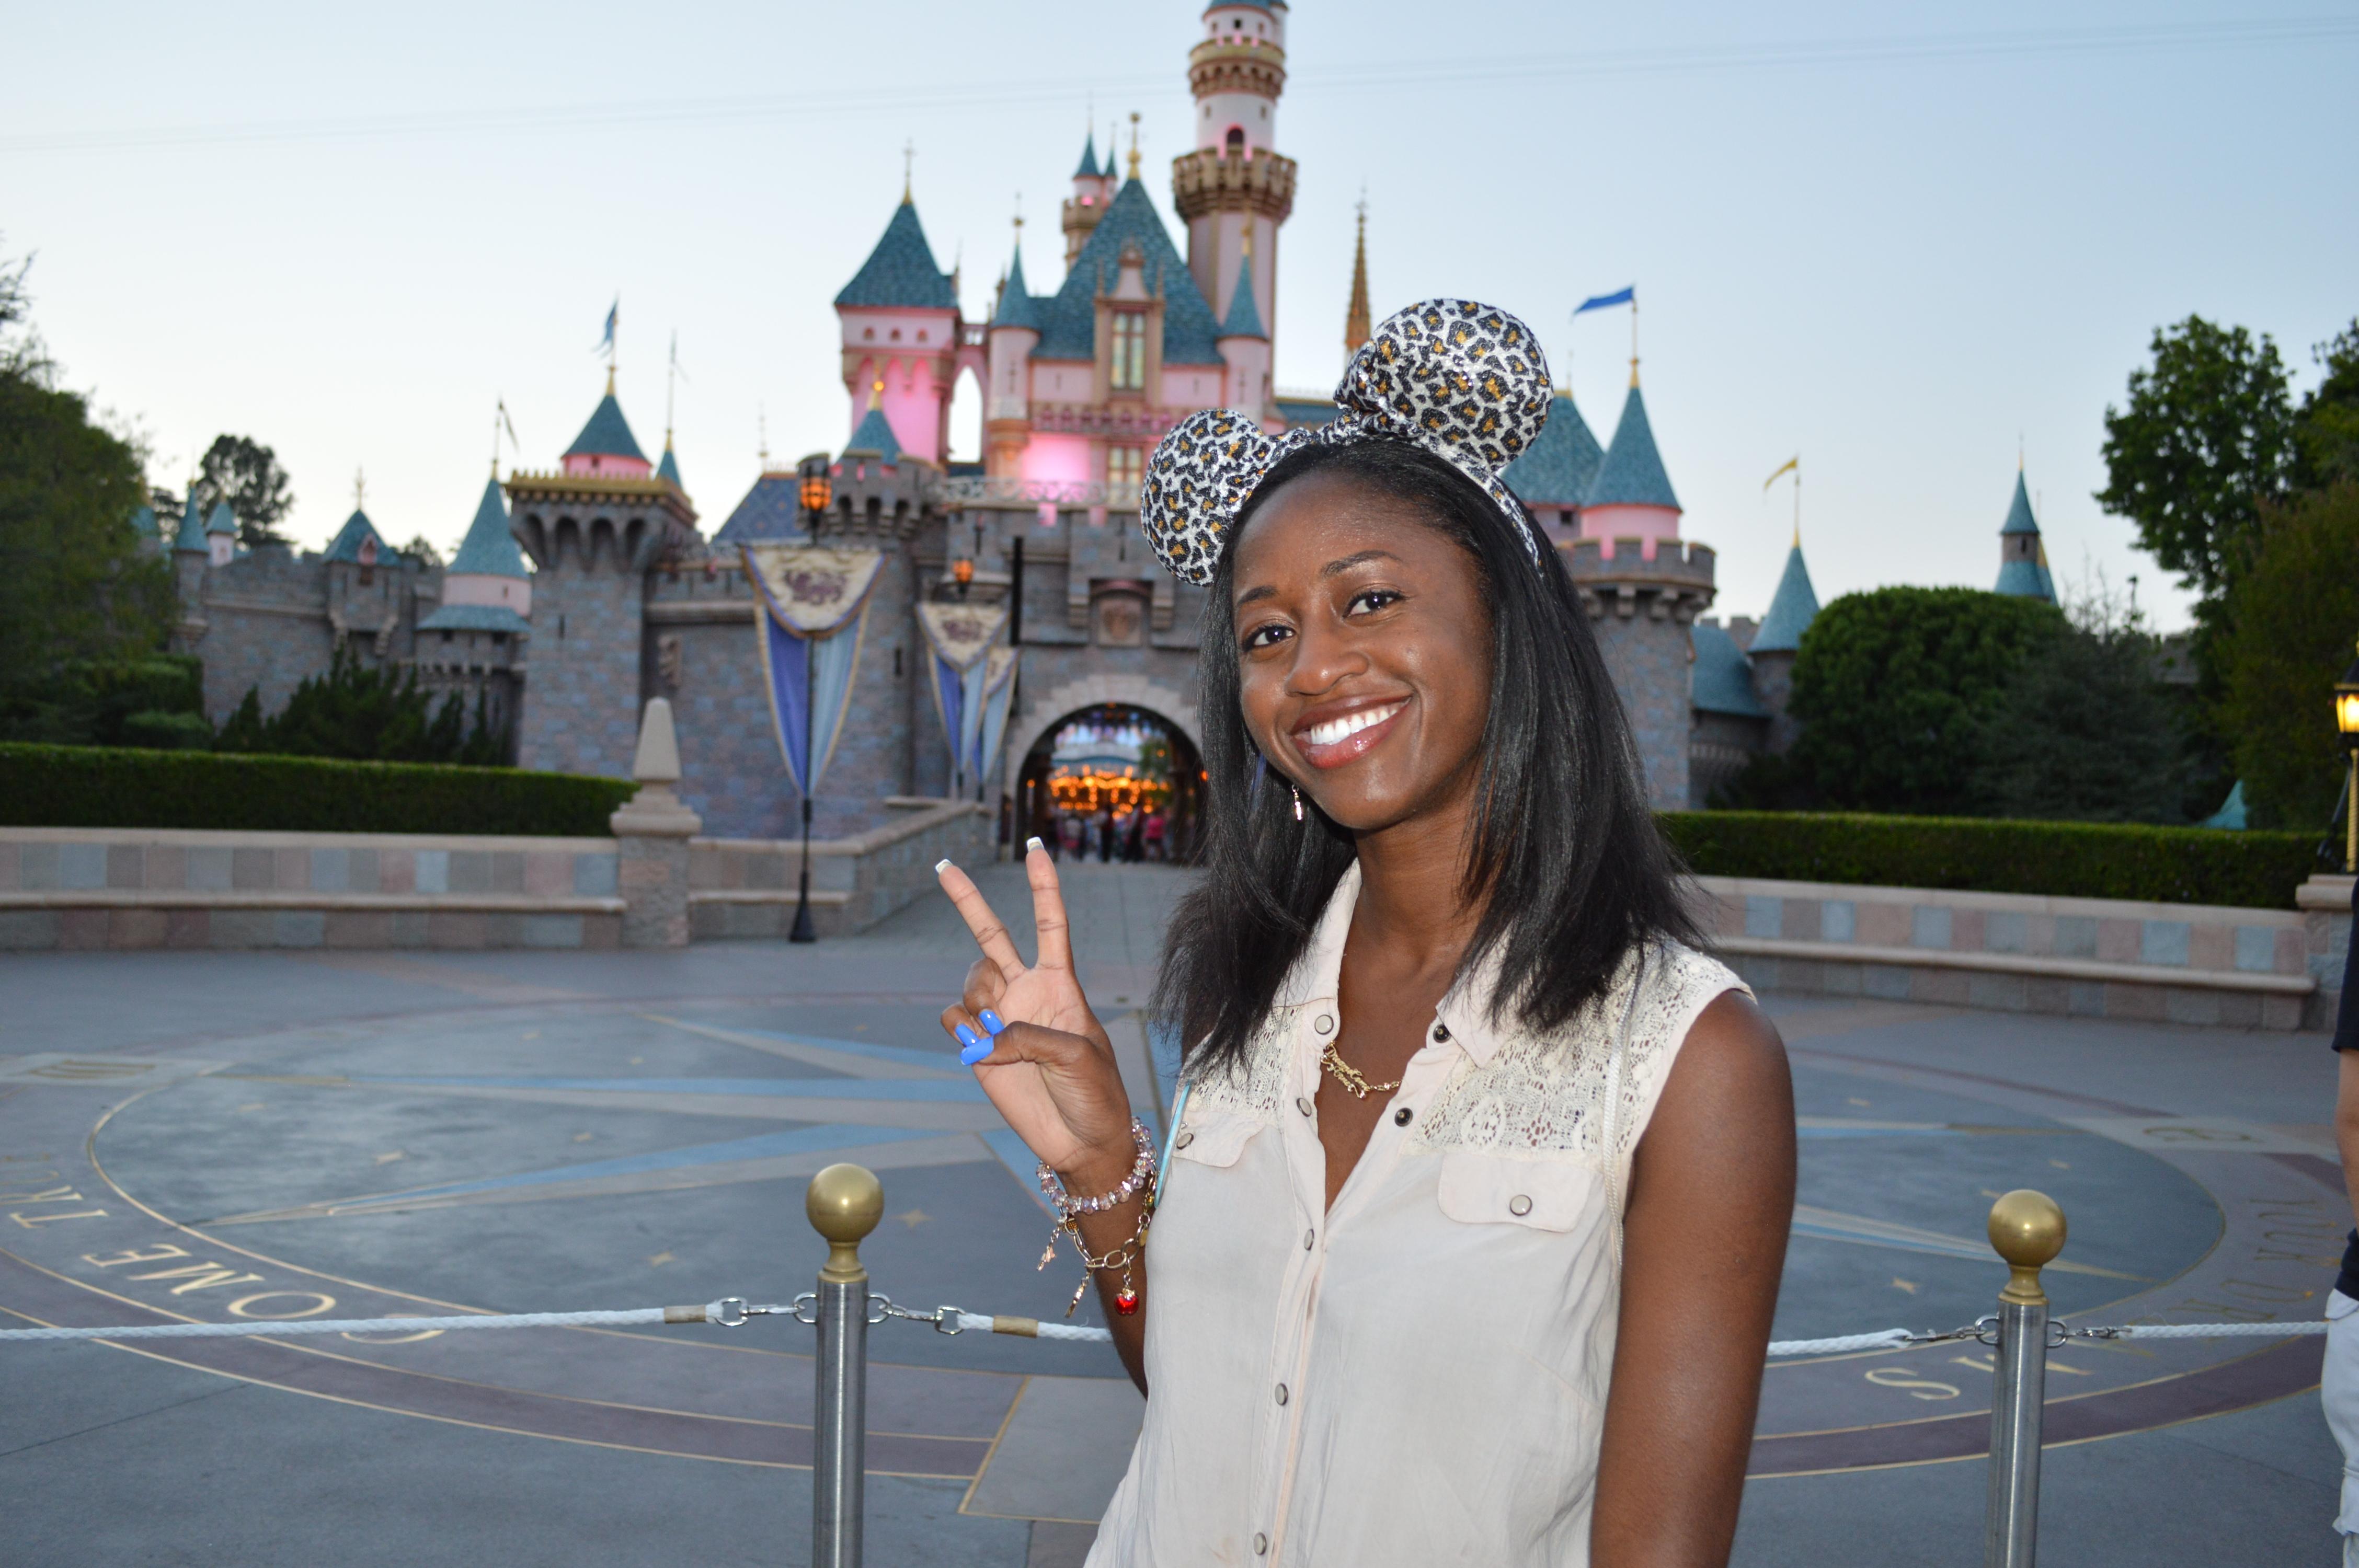 Disneyland vs California Adventure theme park